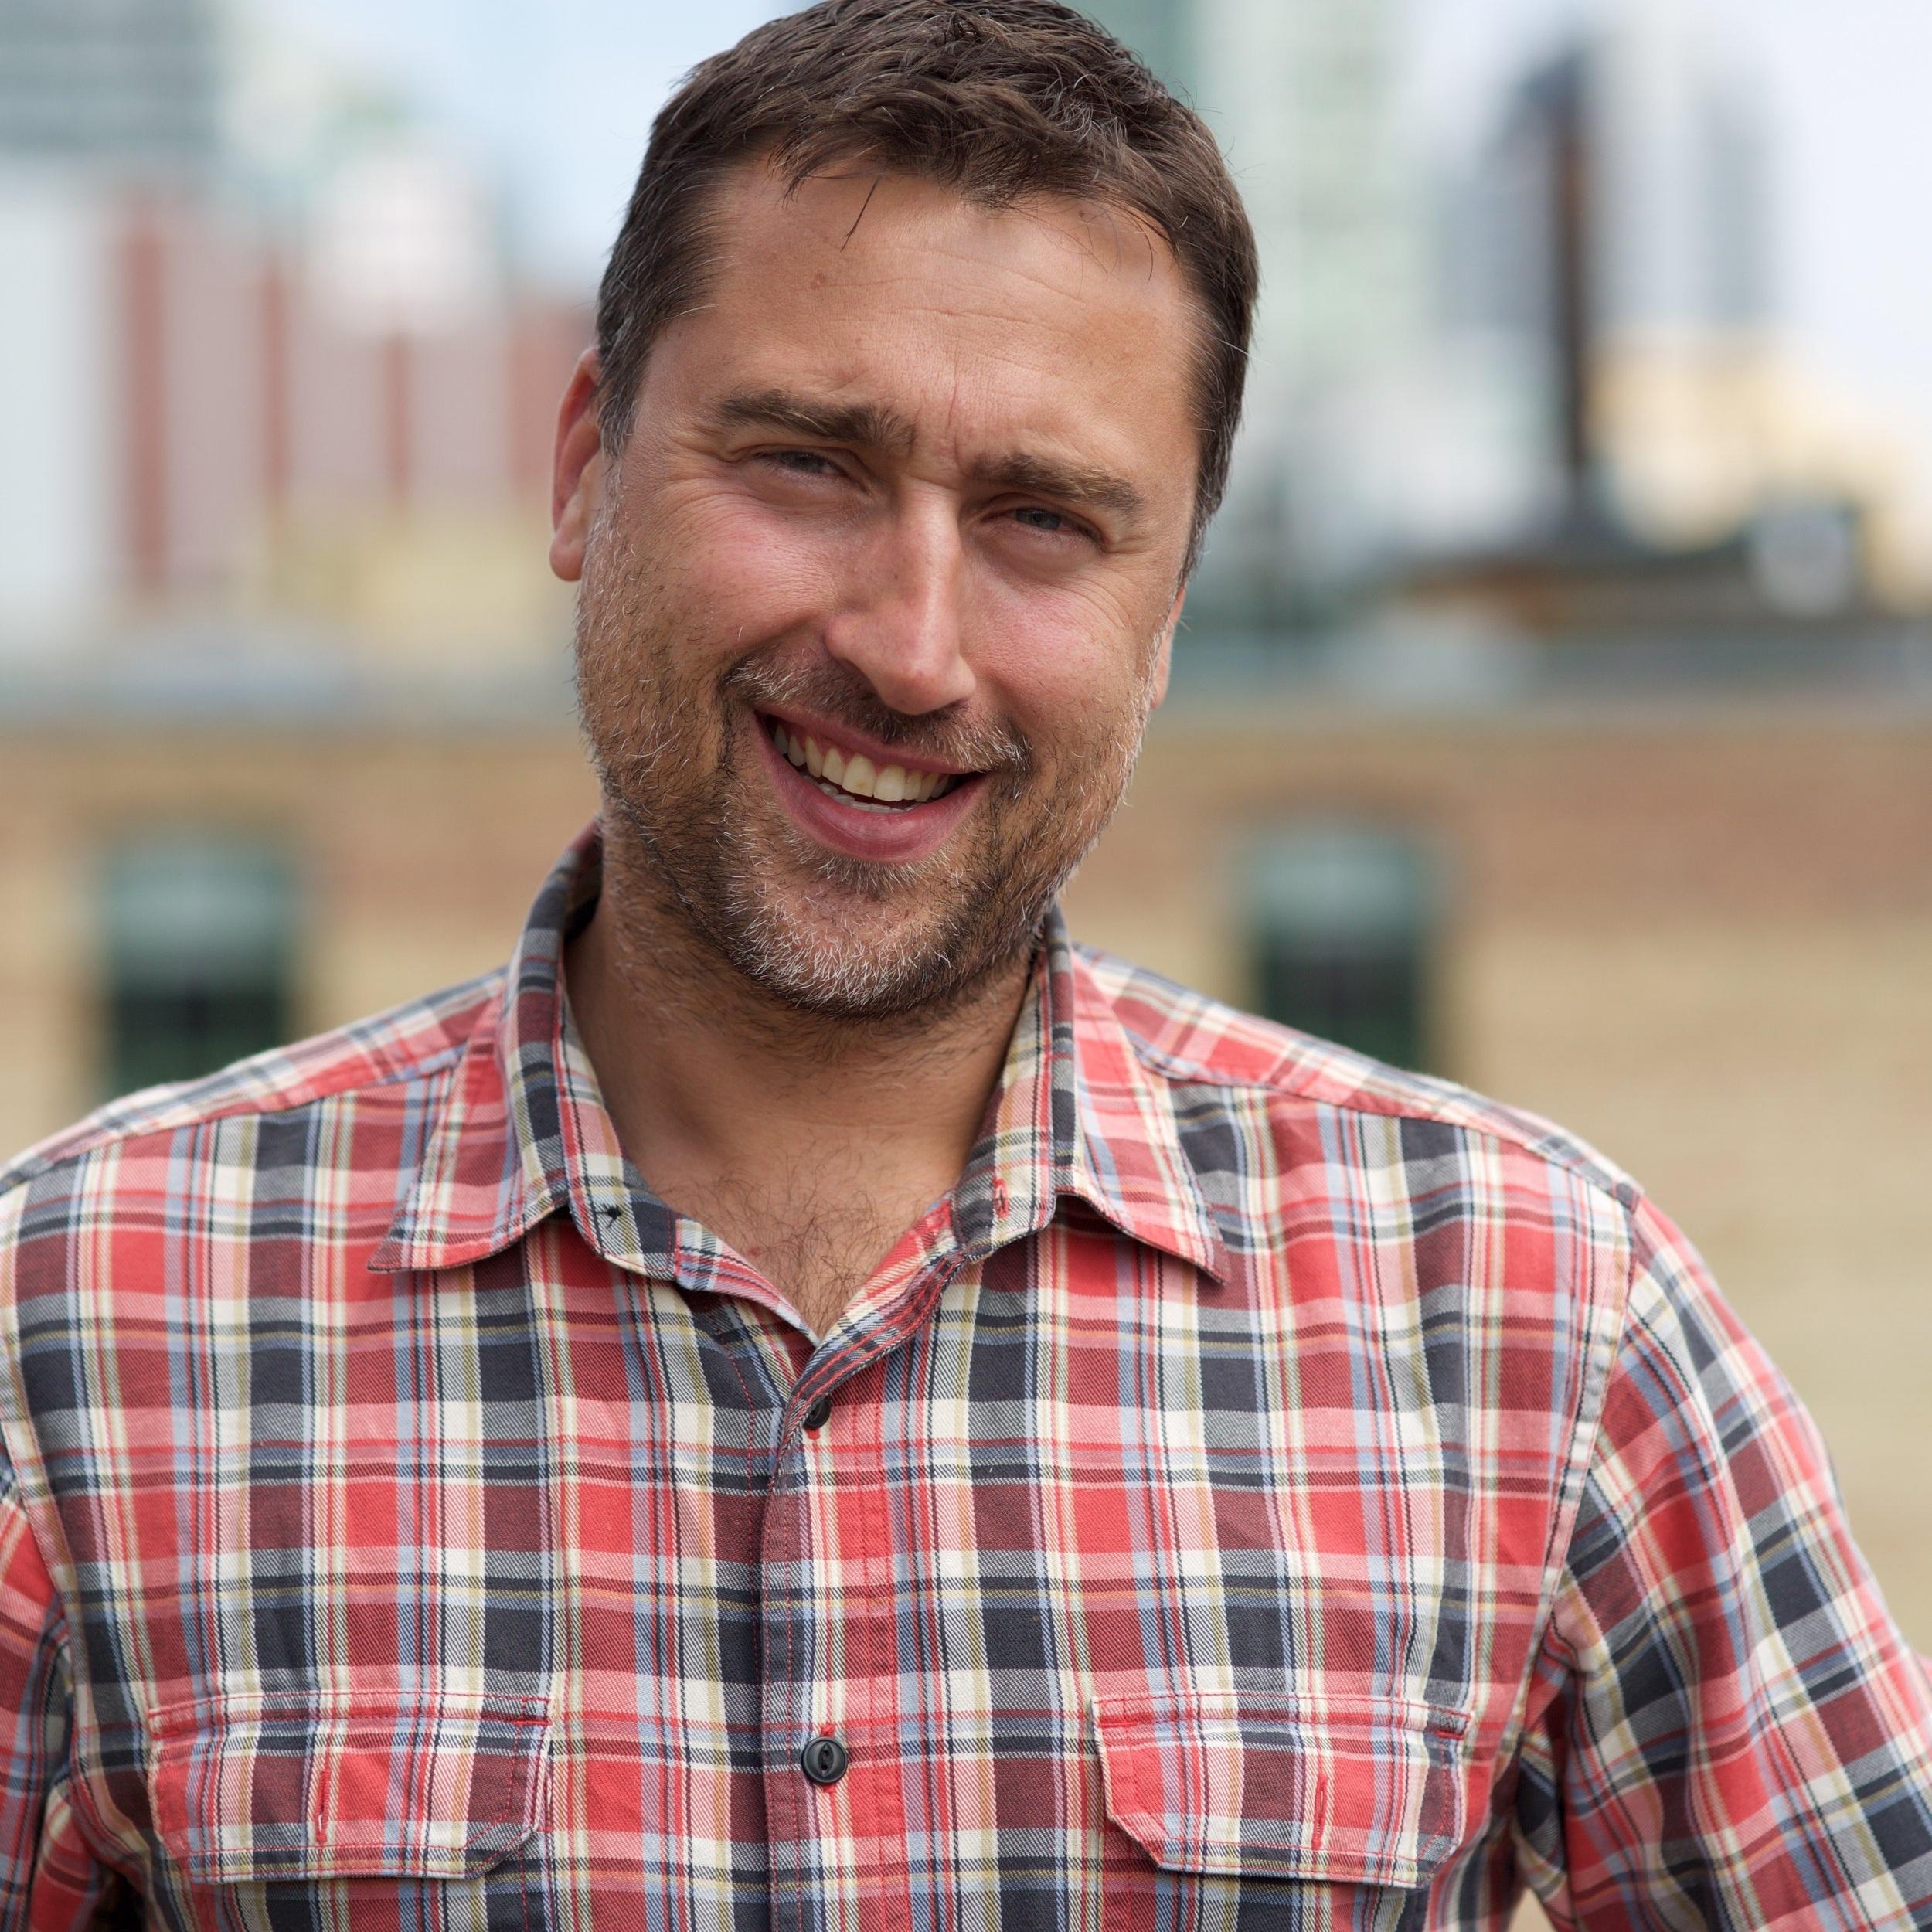 Martin cieszewski - Digital Marketing Advisor*He, Him*